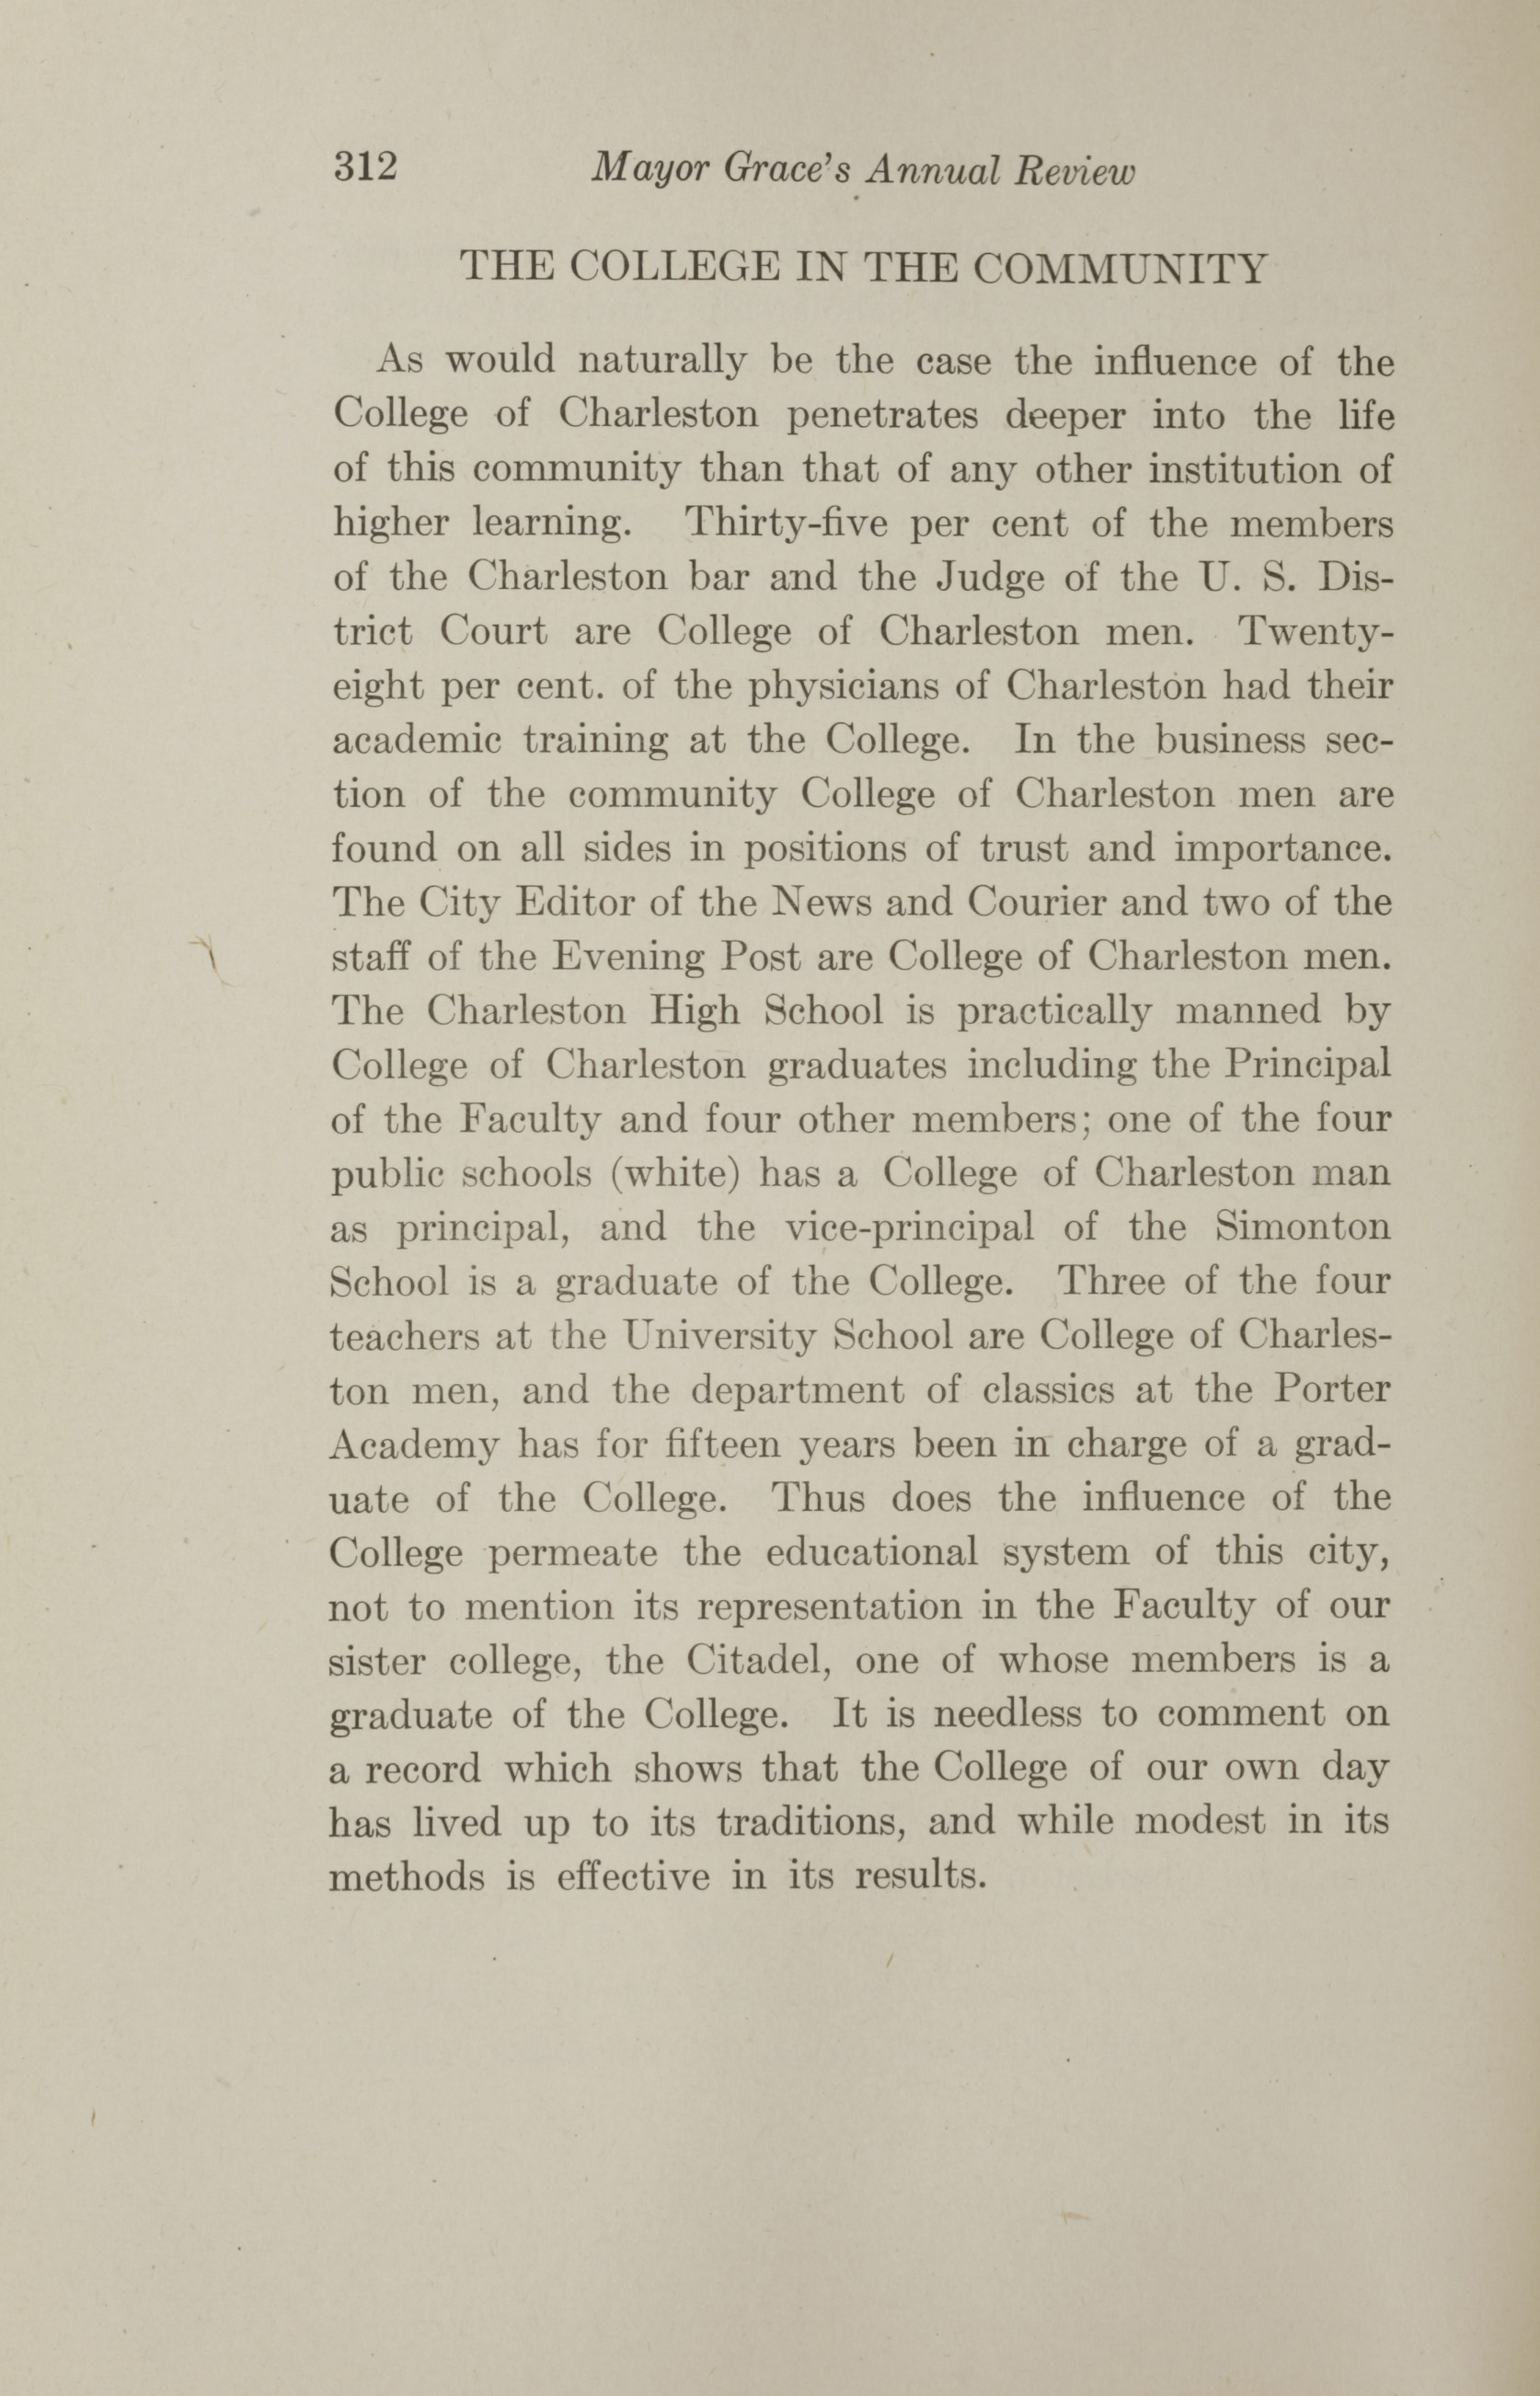 Charleston Yearbook, 1912, page 312